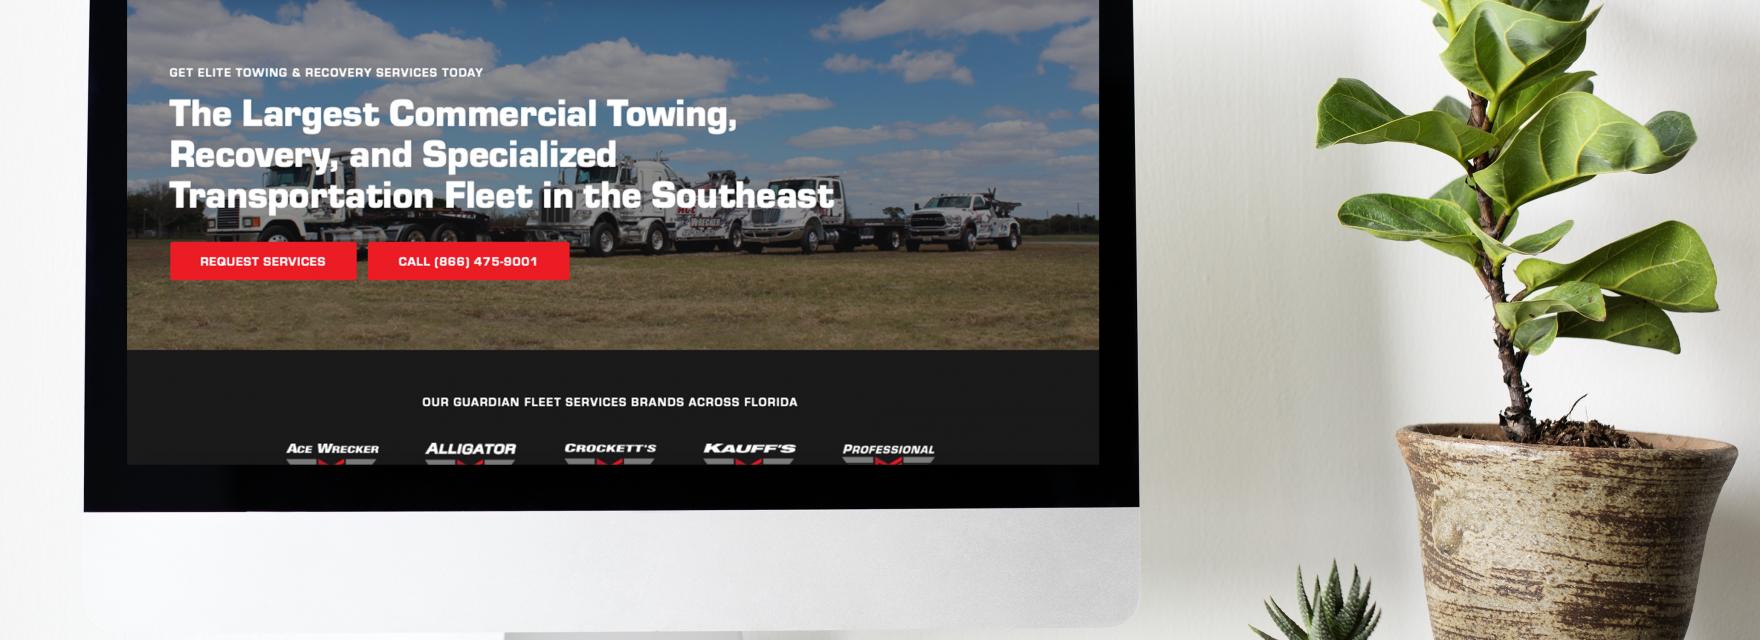 Computer displaying new Guardian Fleet Services website